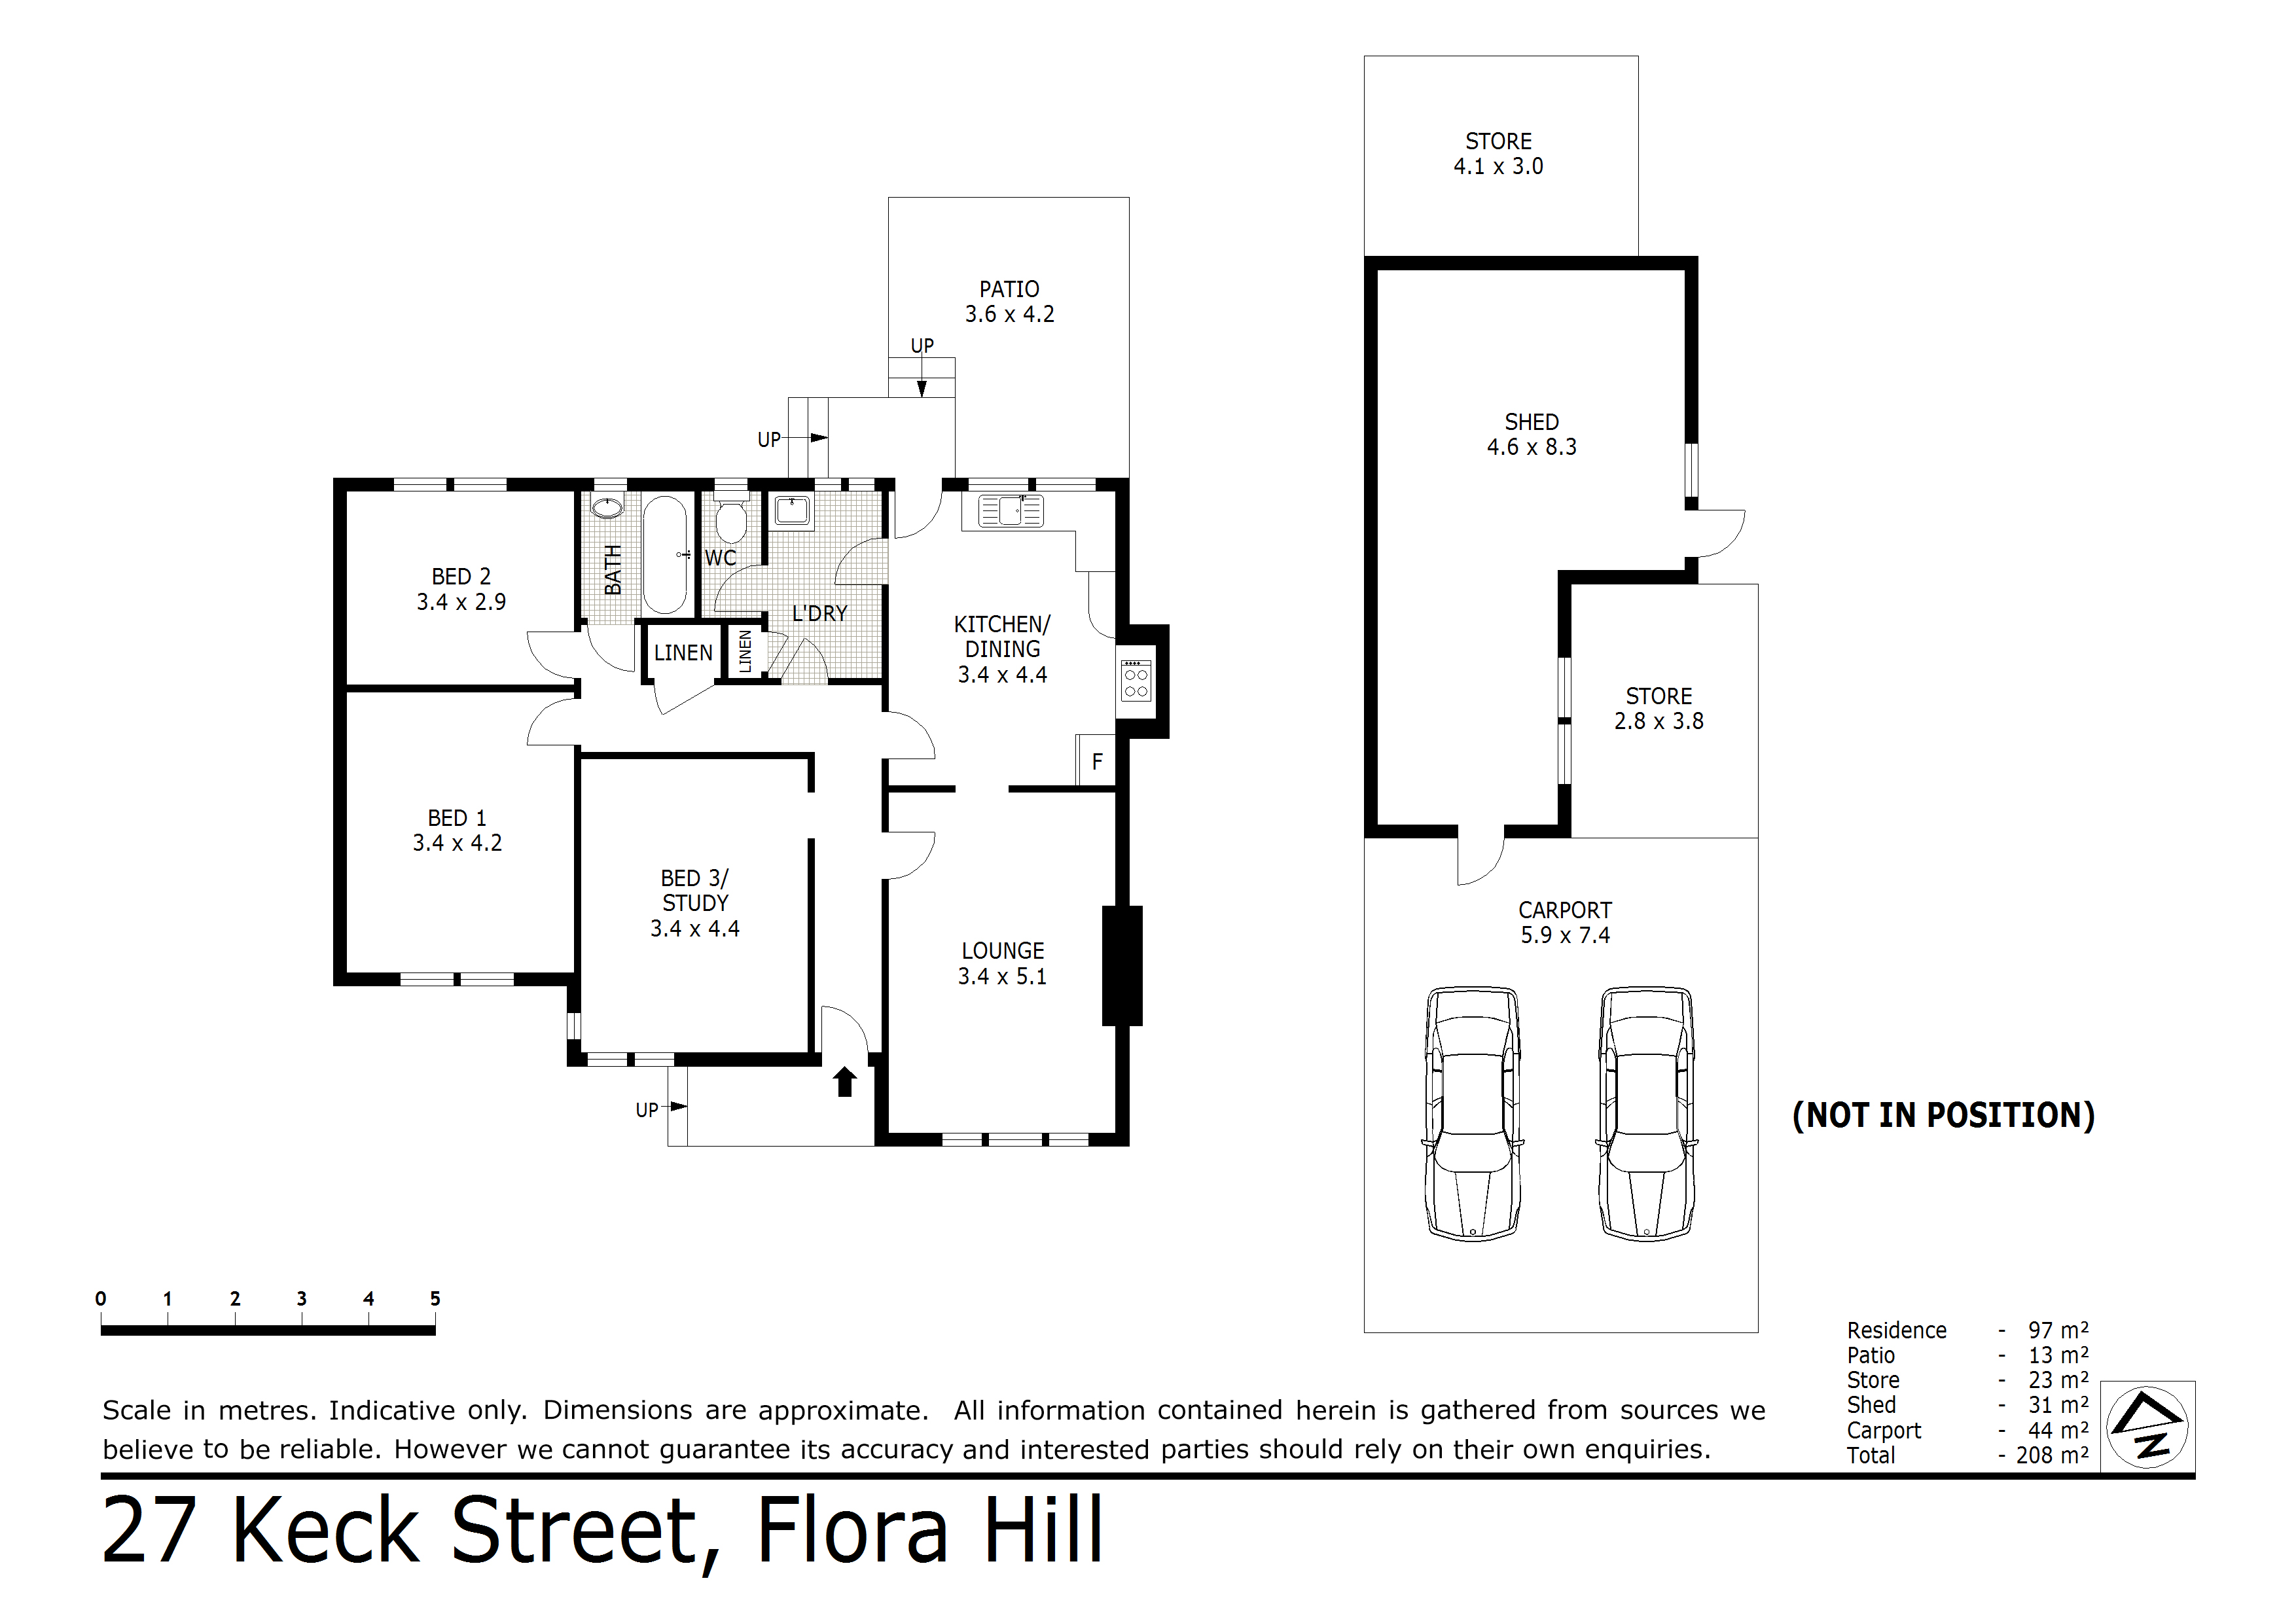 27 Keck Street, Flora Hill, VIC 3550